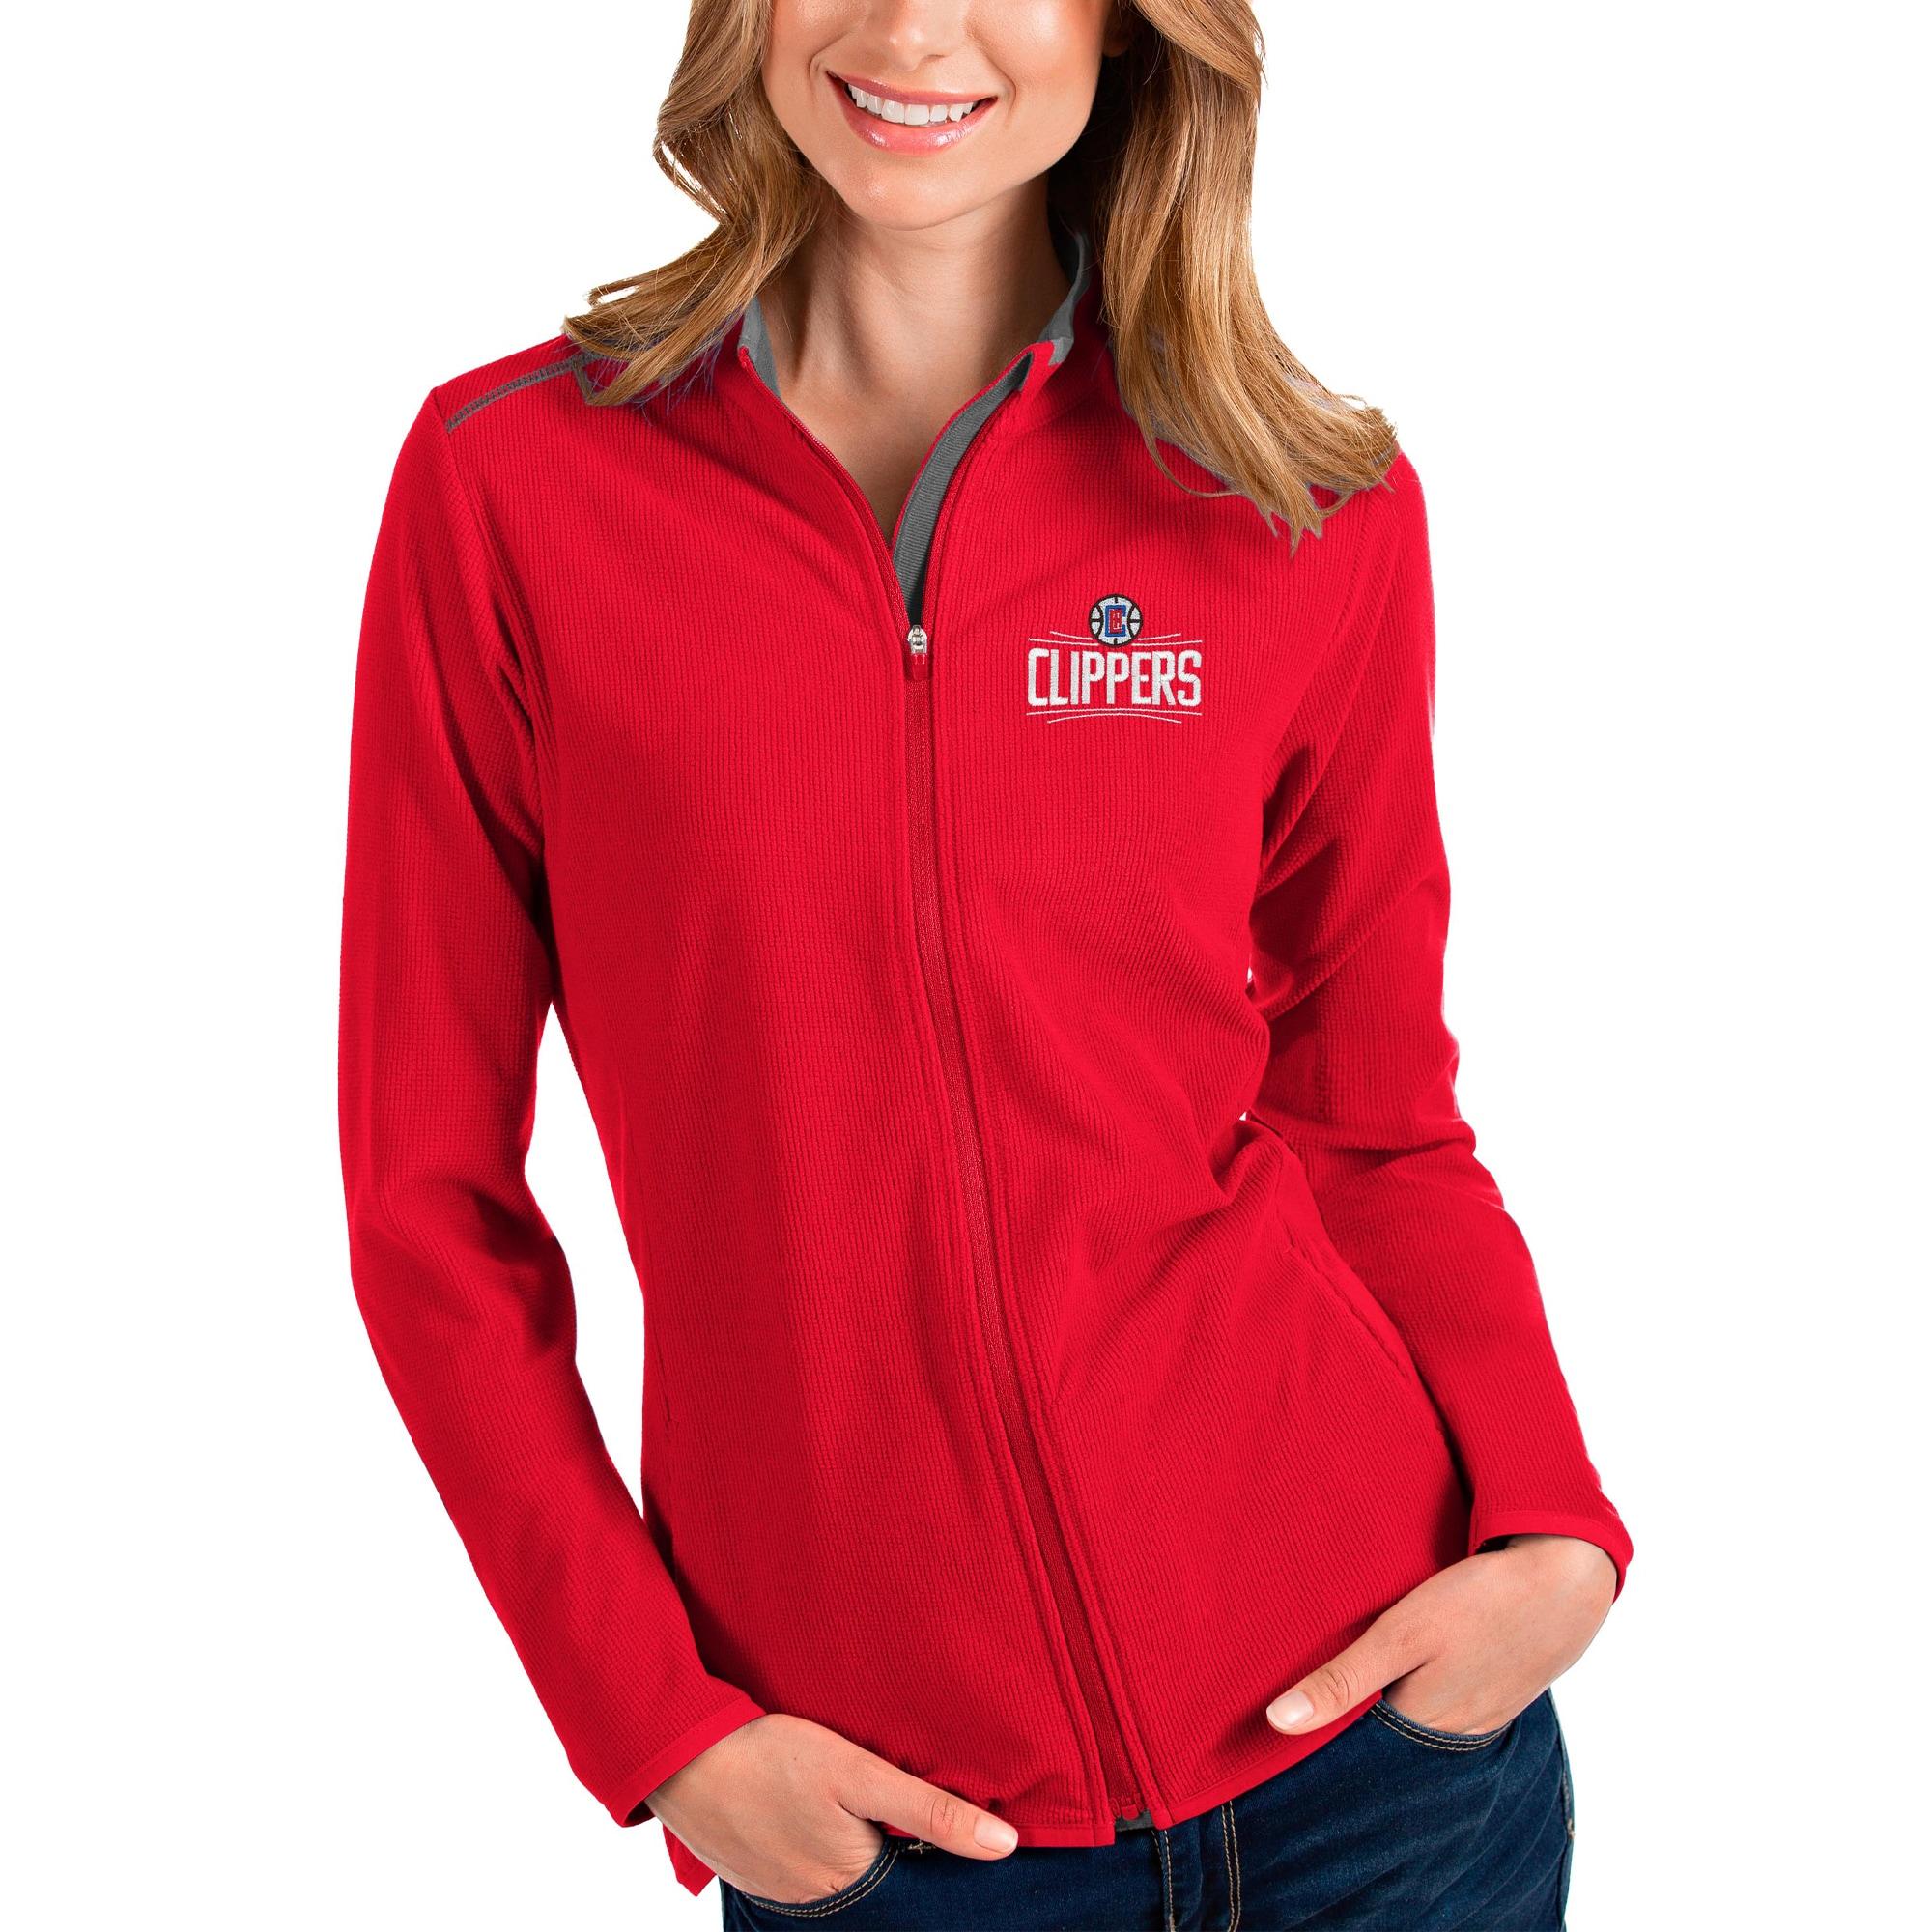 LA Clippers Antigua Women's Glacier Full-Zip Jacket - Red/Gray